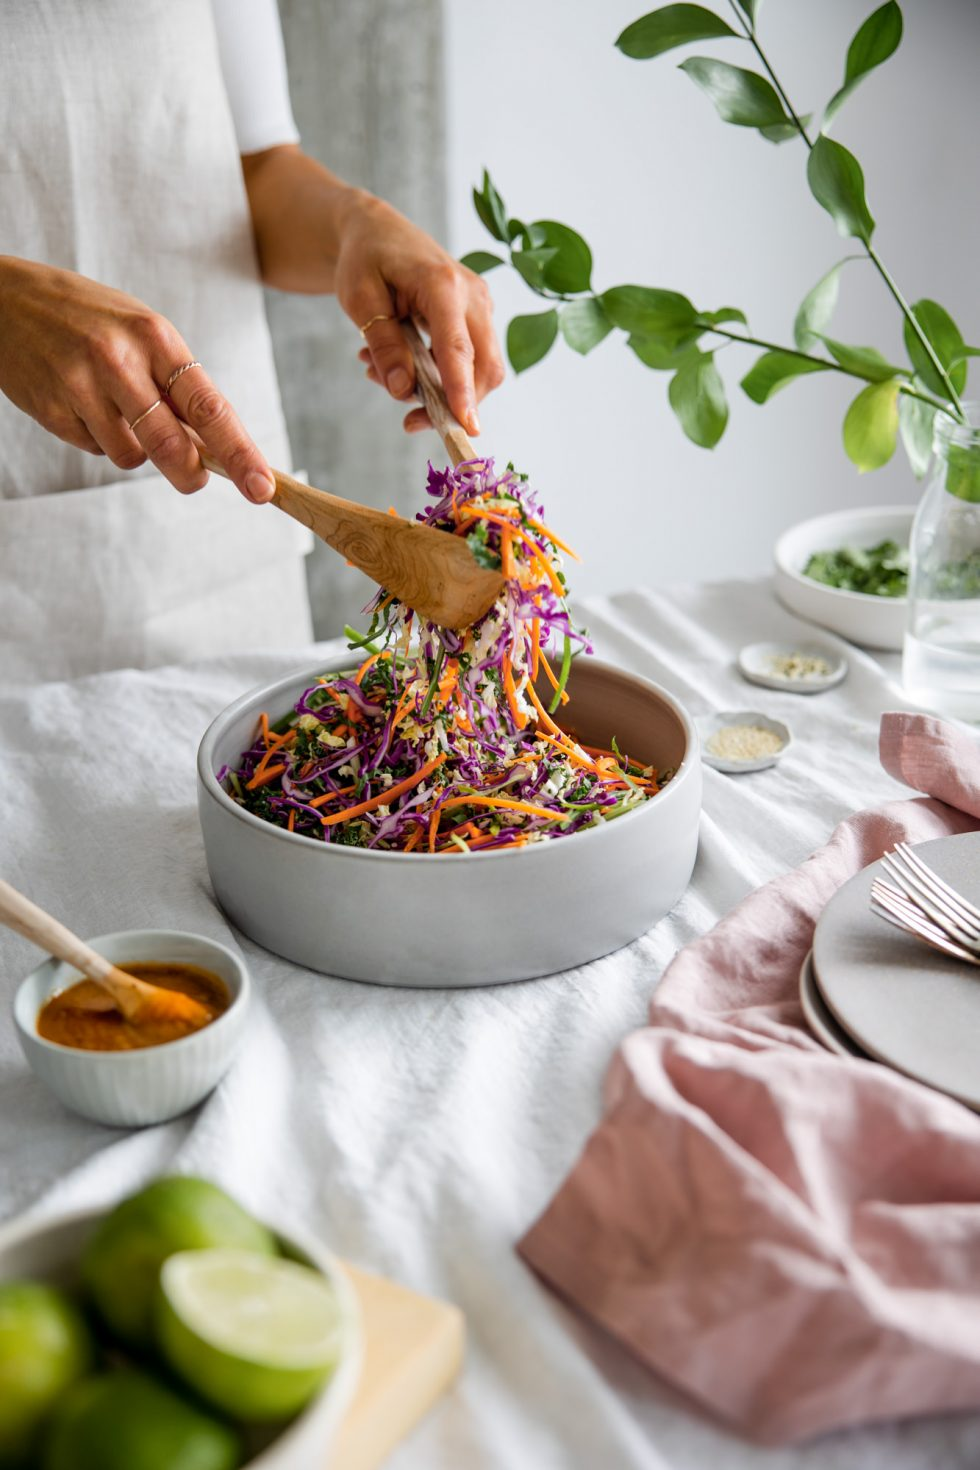 genevieve-plante-salad-book-food-lifestyle-photographer-laura-g-diaz-7